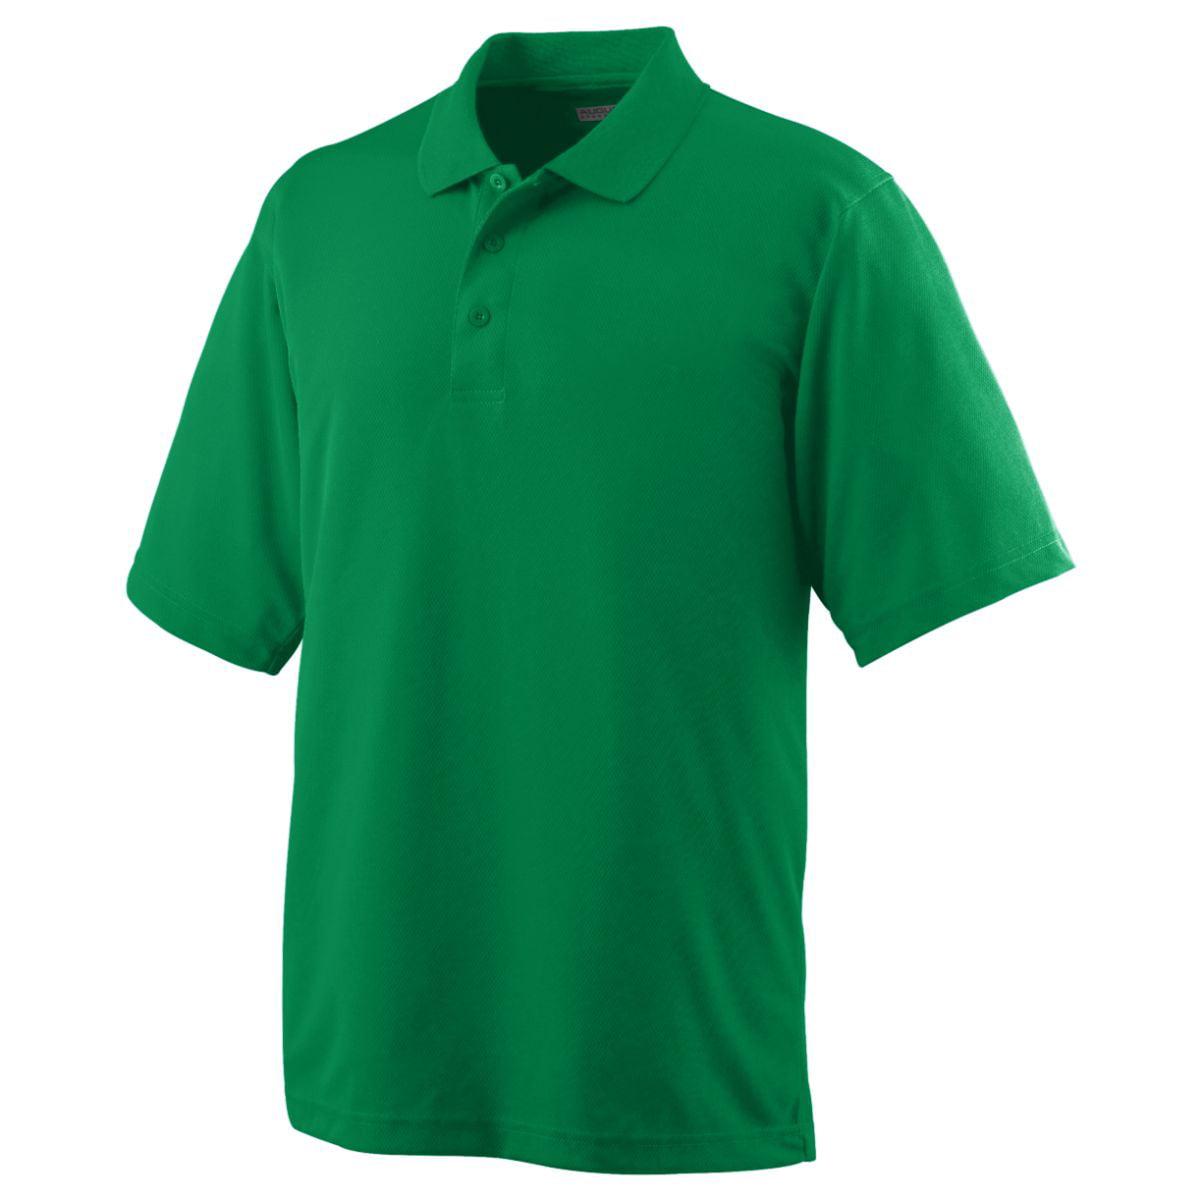 5095 Wicking Mesh Sport Shirt KELLY M